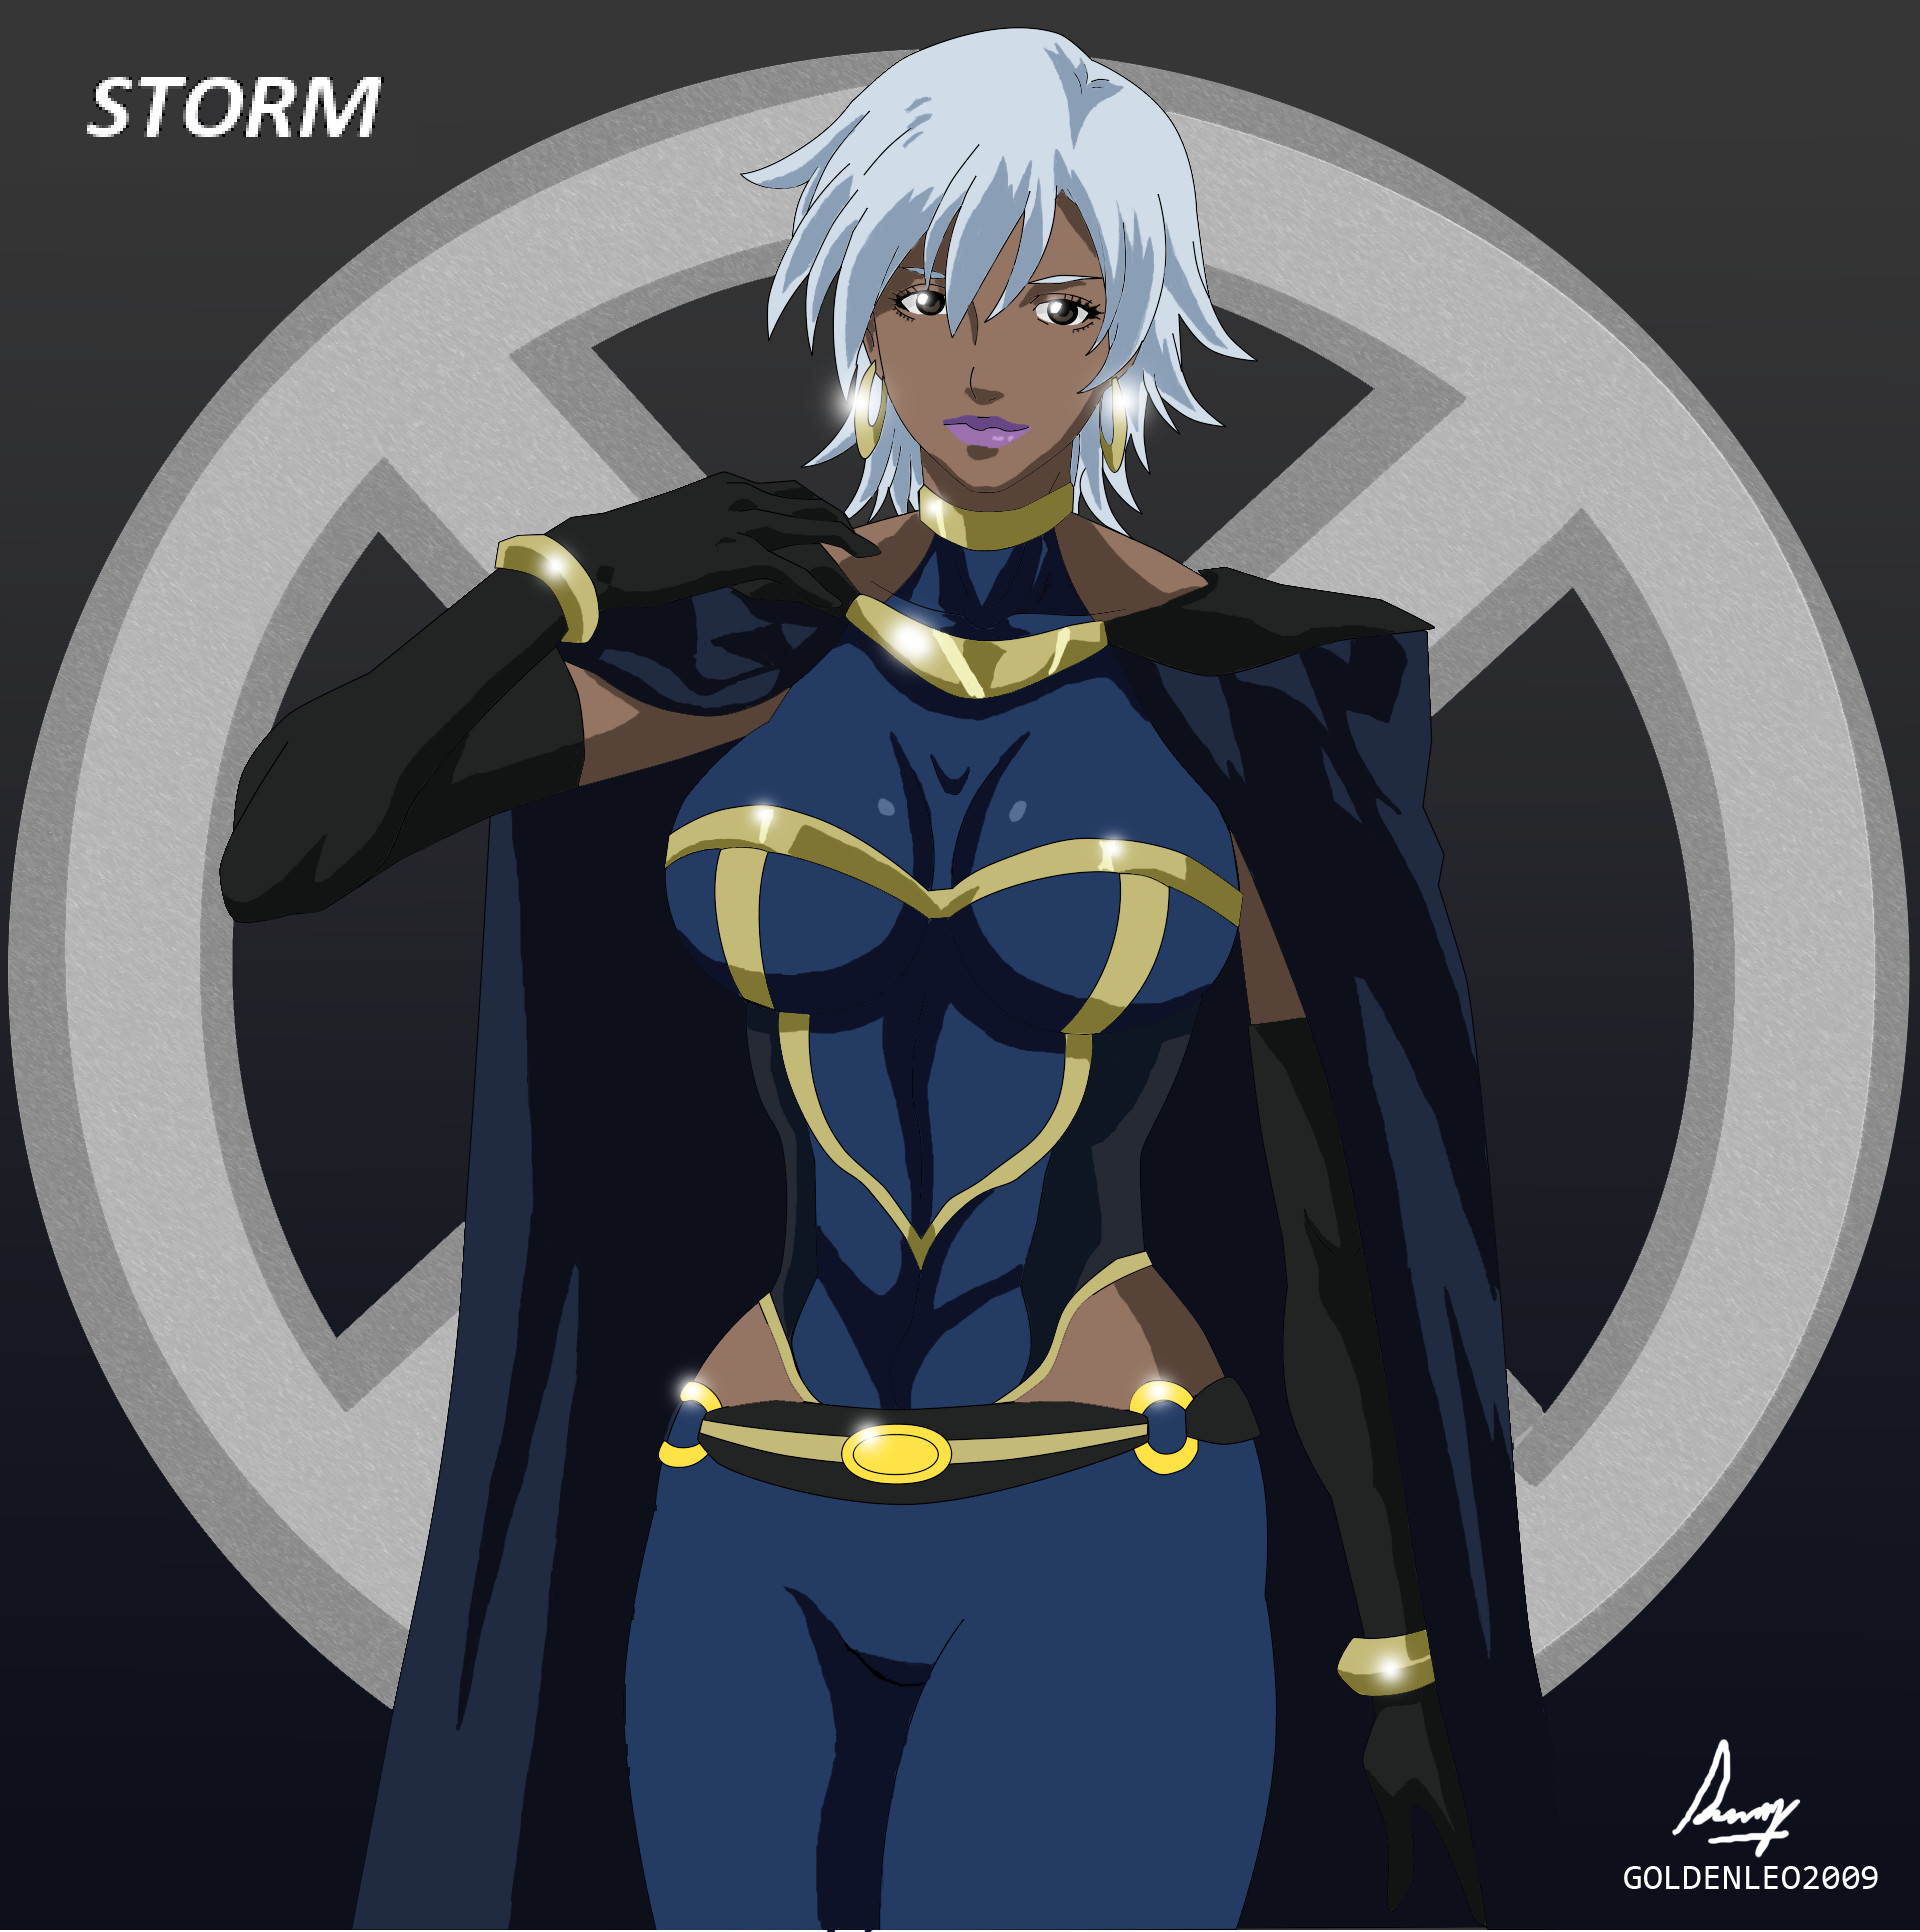 Adult fanfiction xmen storm Tell